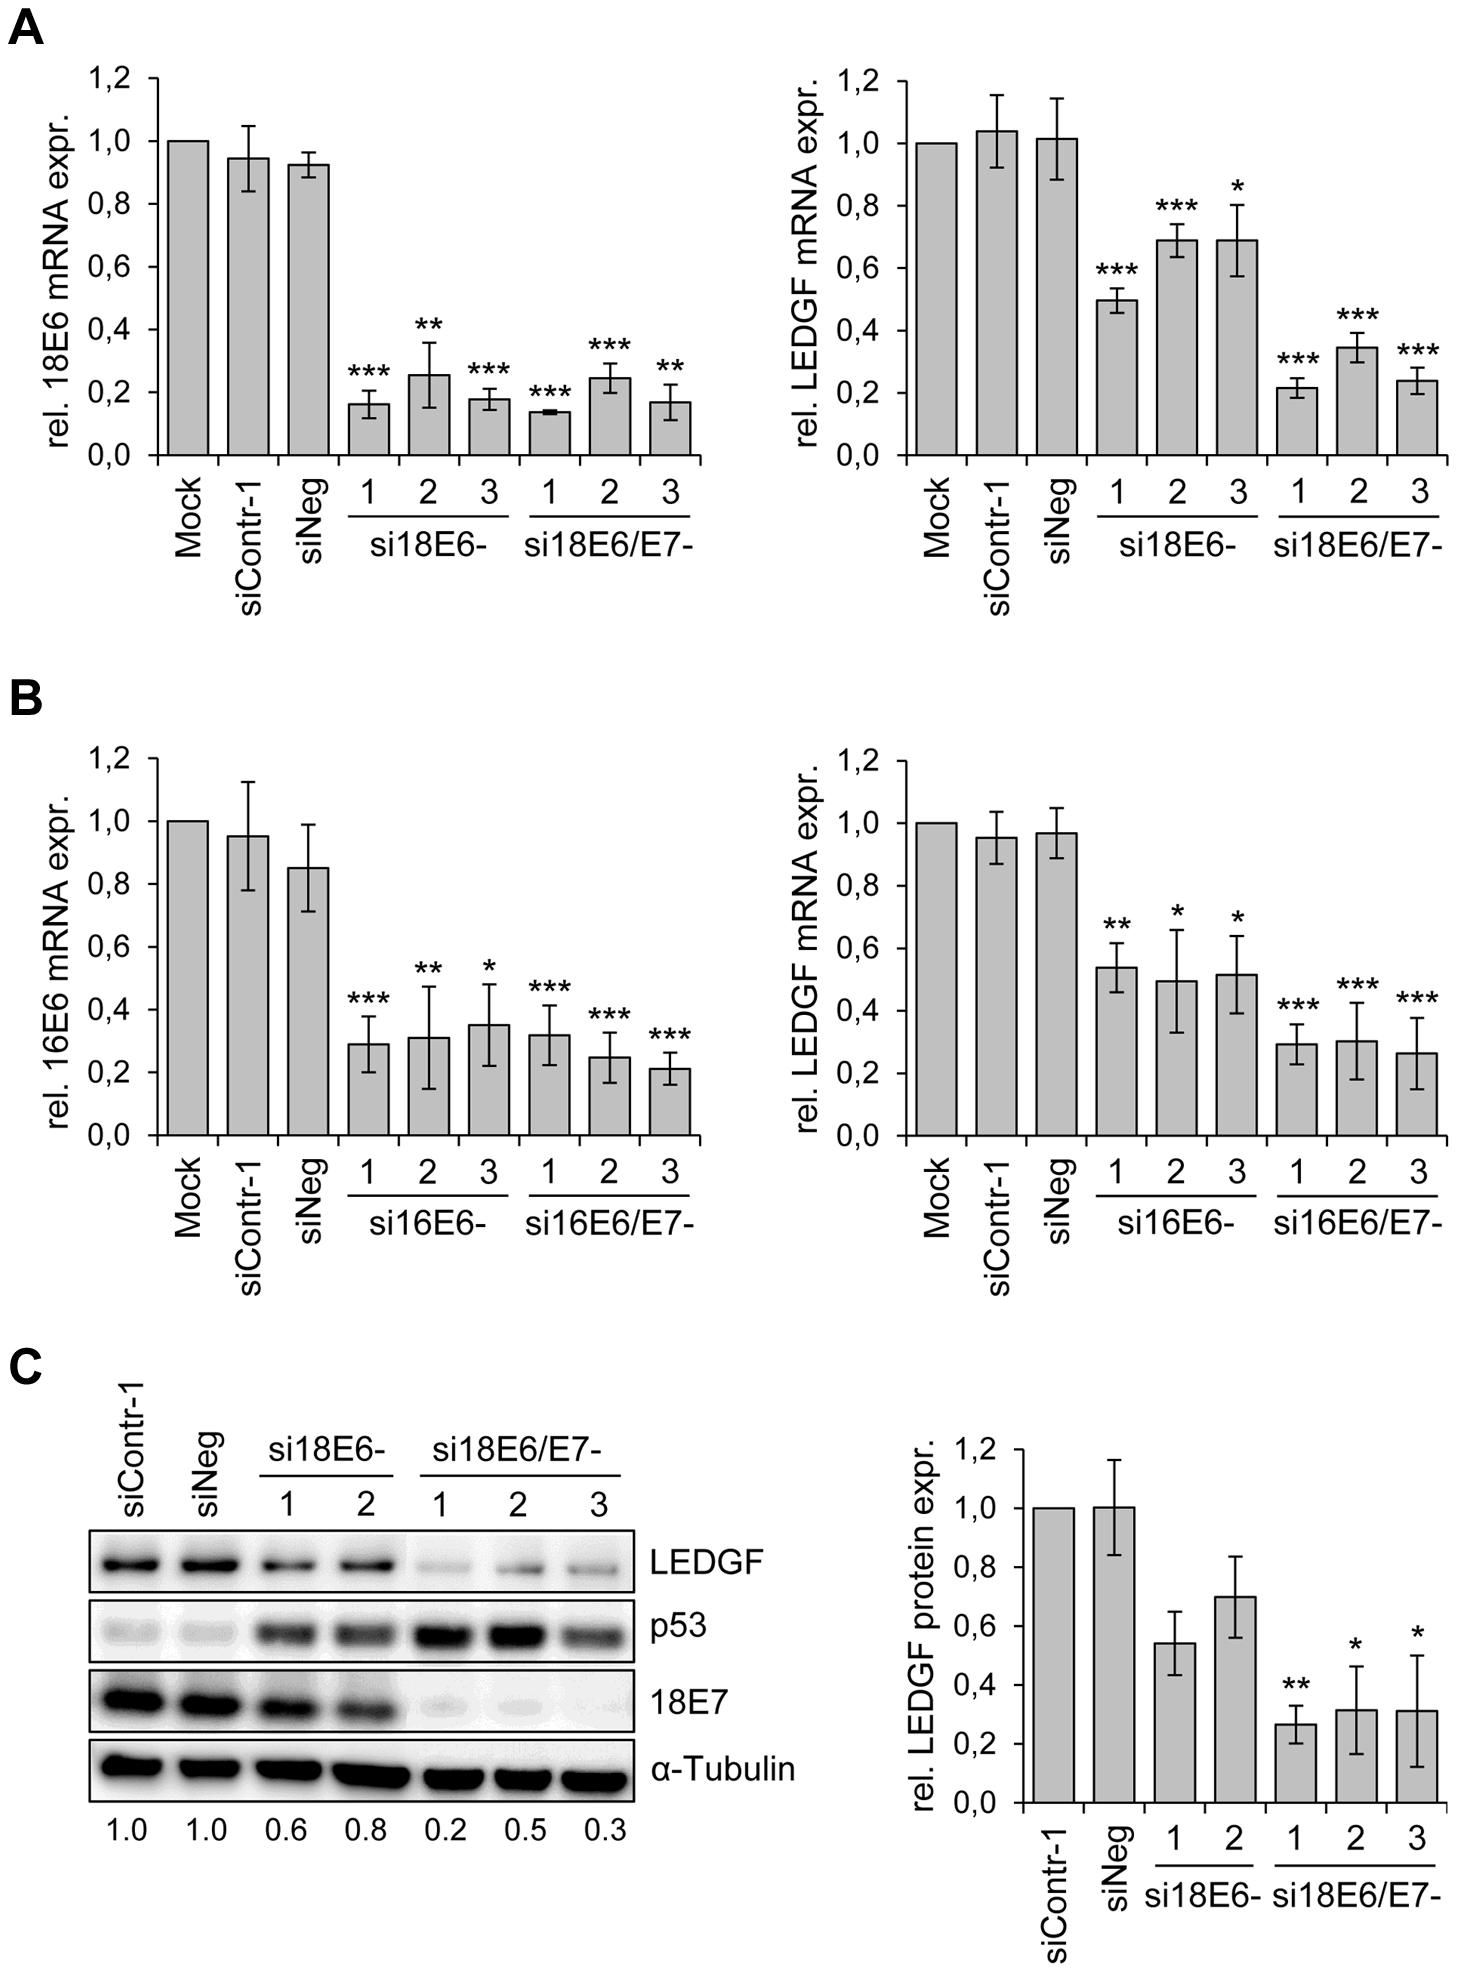 HPV oncogene silencing represses <i>LEDGF</i> expression.